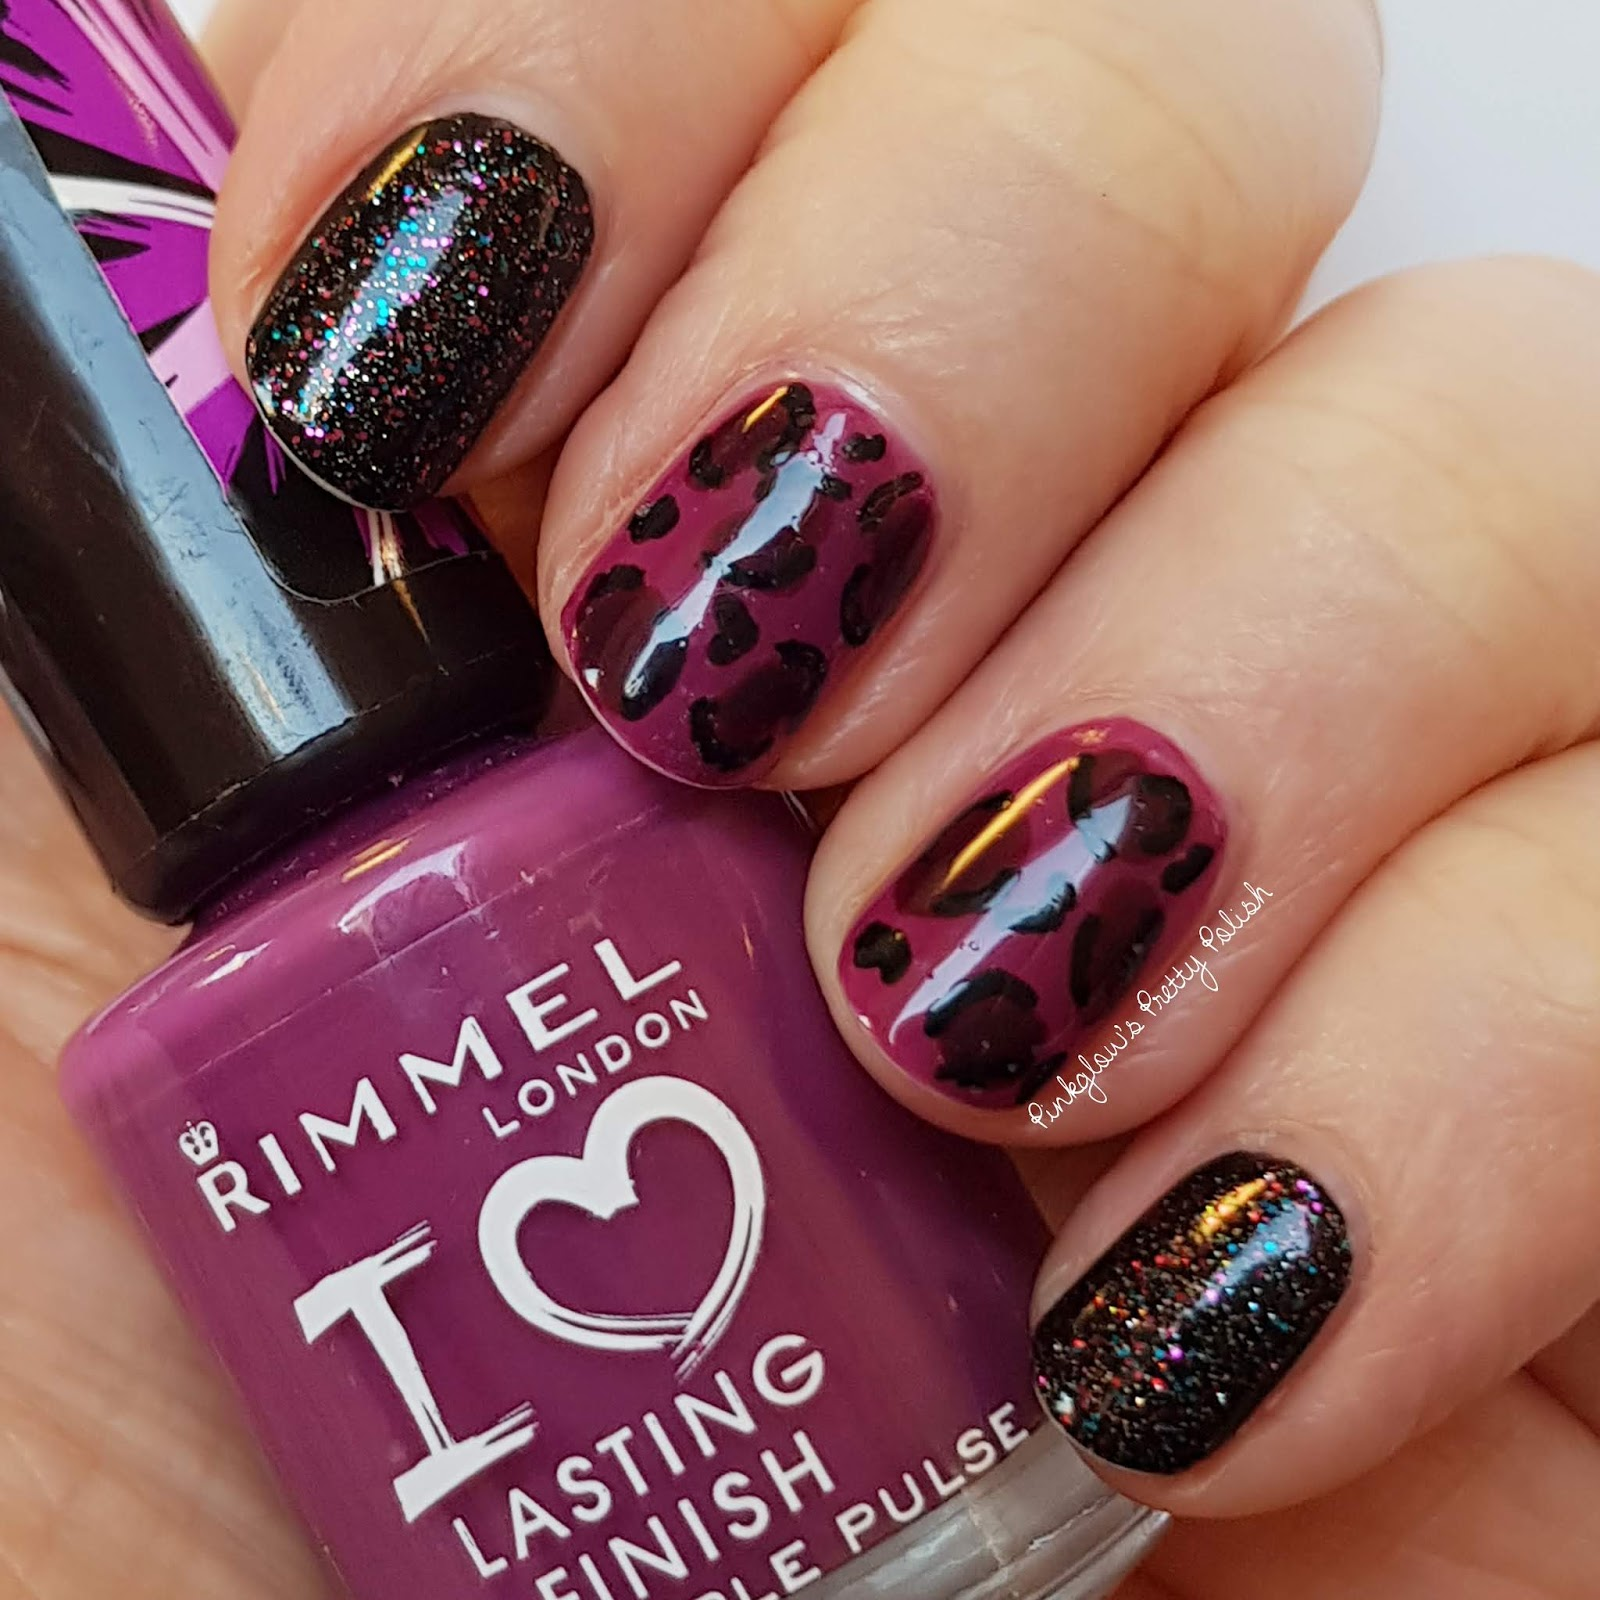 Pinkglows Pretty Polish Uk Nail Art Blog